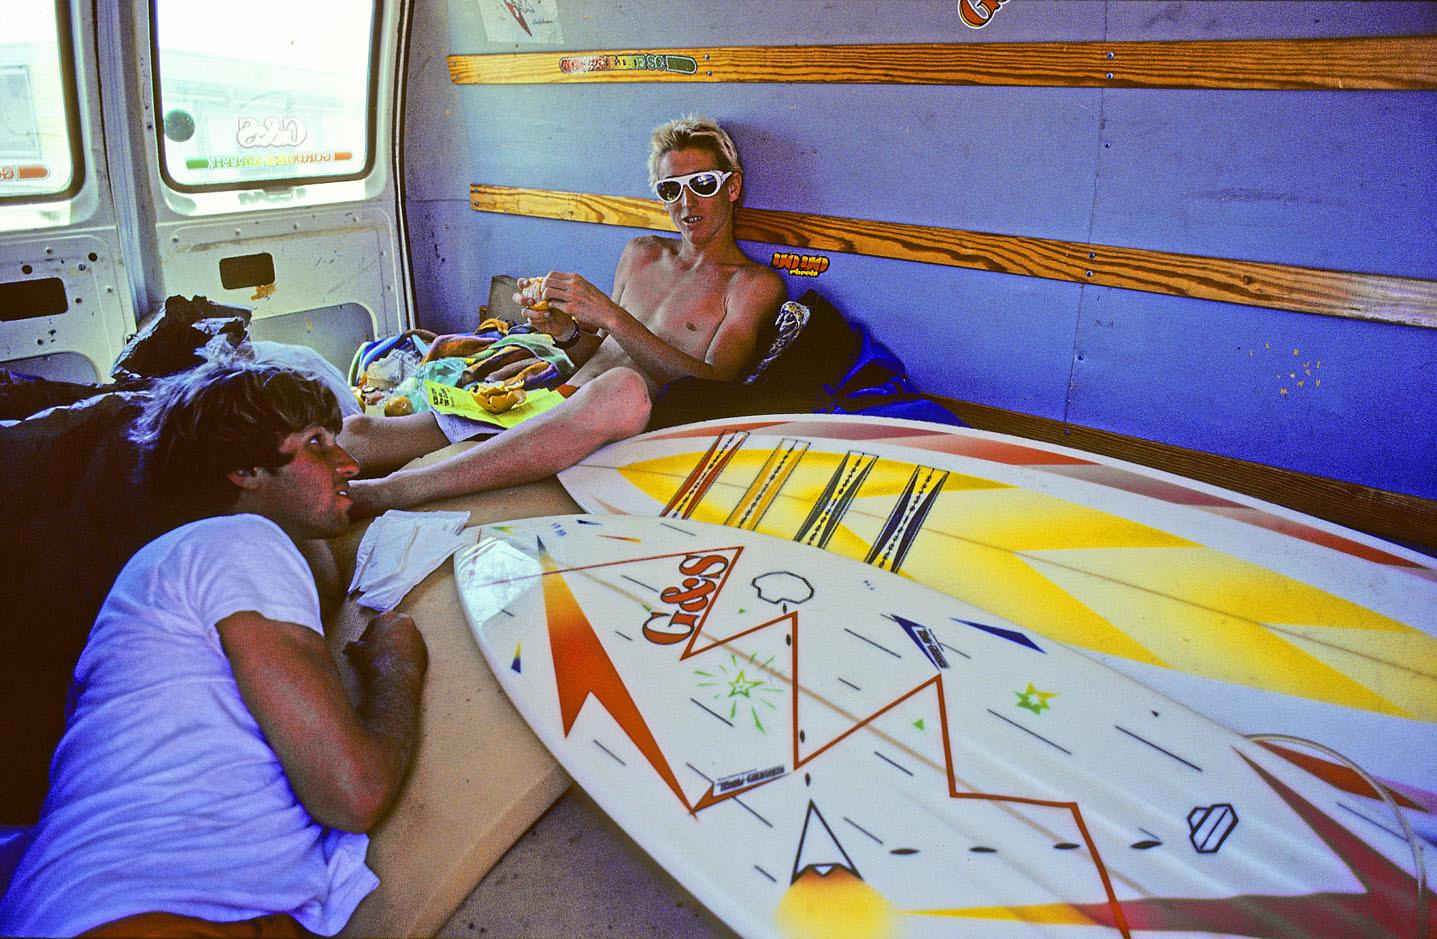 JACK CASSIDY WITH GLASSES, OCEAN BEACH, SAN DIEGO, CALIF. 1981.